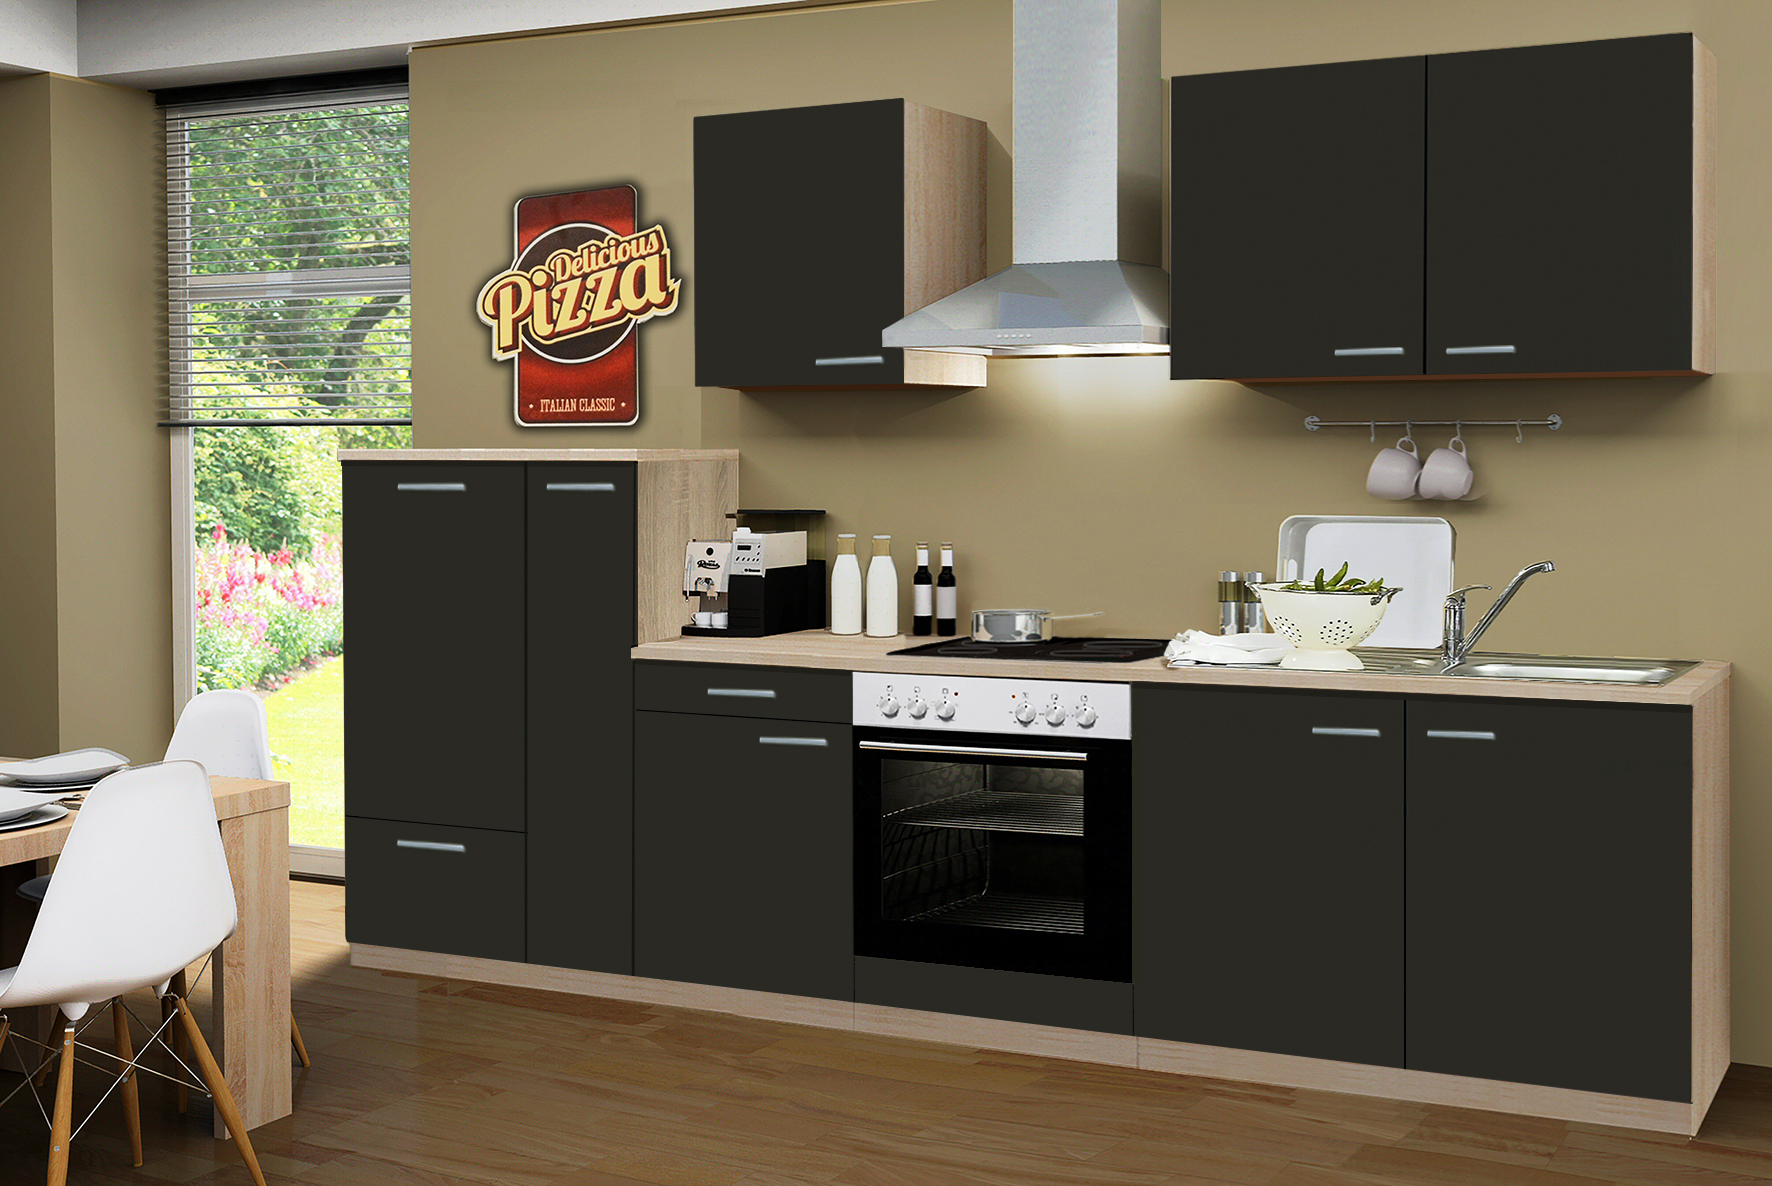 k che mit elektroger ten k chenblock mit e ger ten. Black Bedroom Furniture Sets. Home Design Ideas